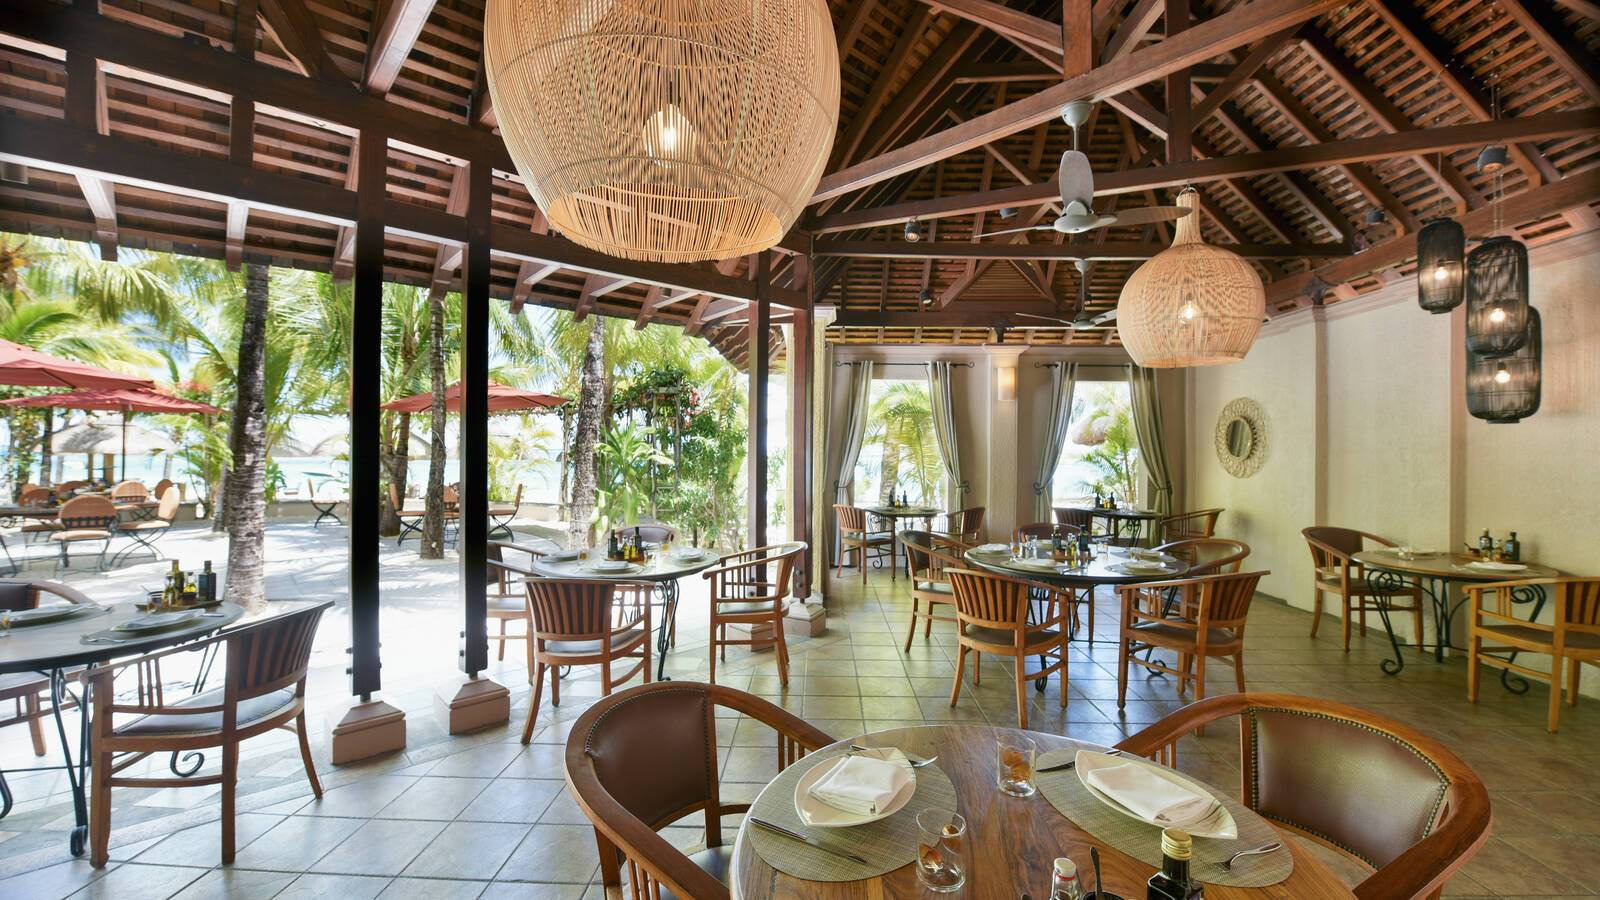 Paradis Beachcomber Restaurant La Palma Maurice